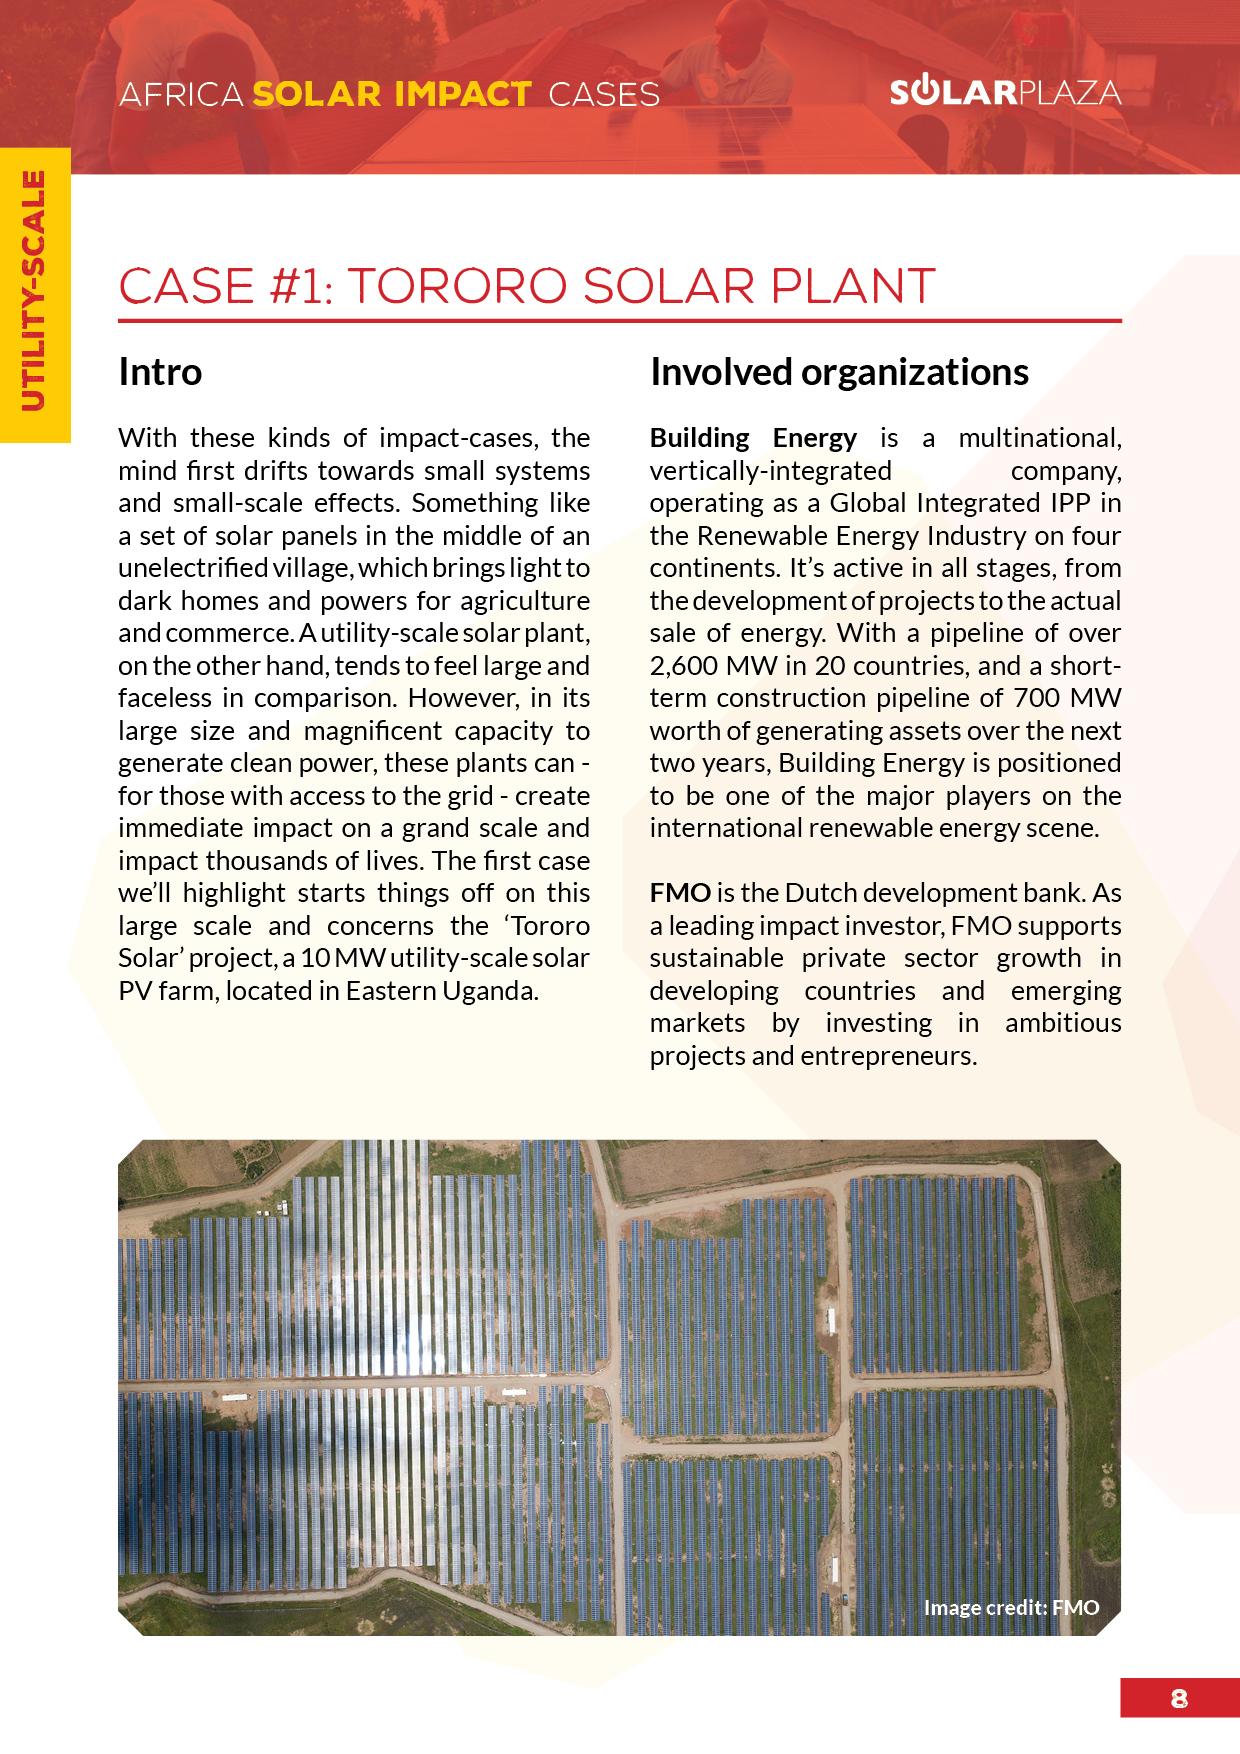 Africa Solar Impact Cases Report 1.0 (SRF)8.jpg